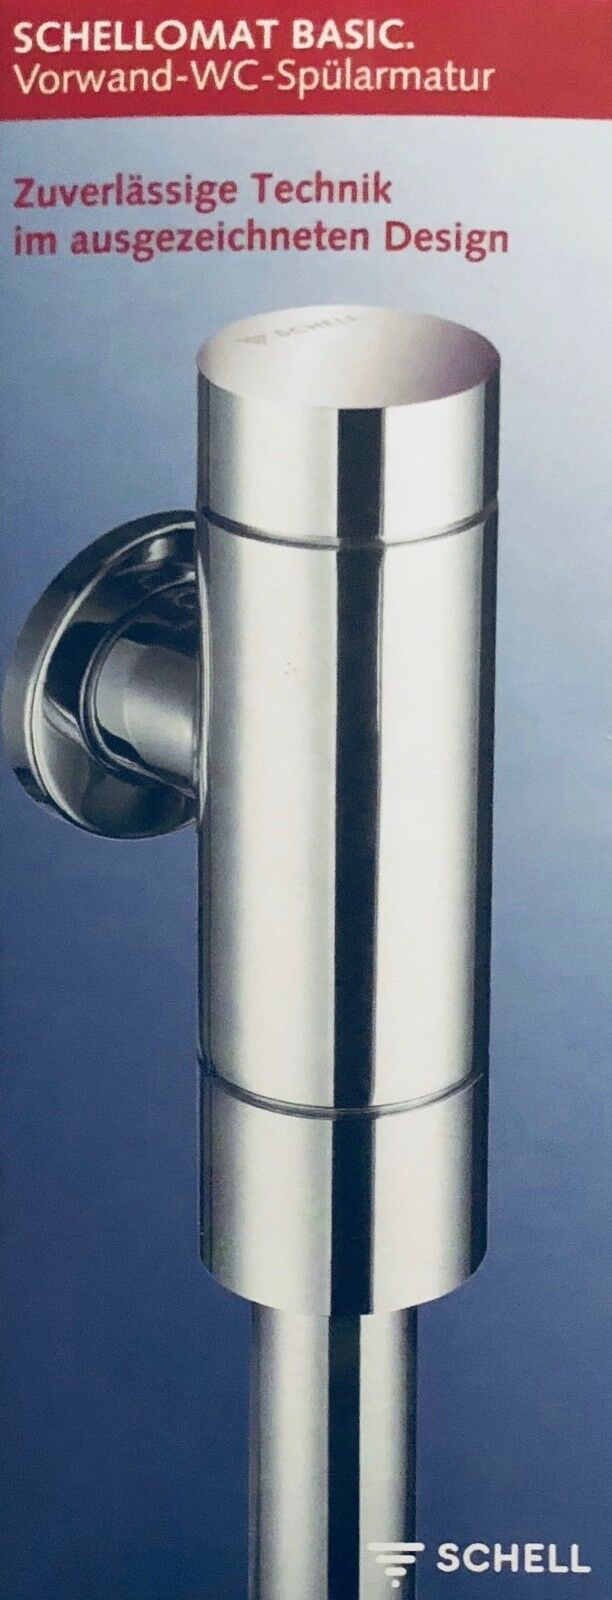 schell 022470699 schellomat basic robinet de chasse pour wc | ebay